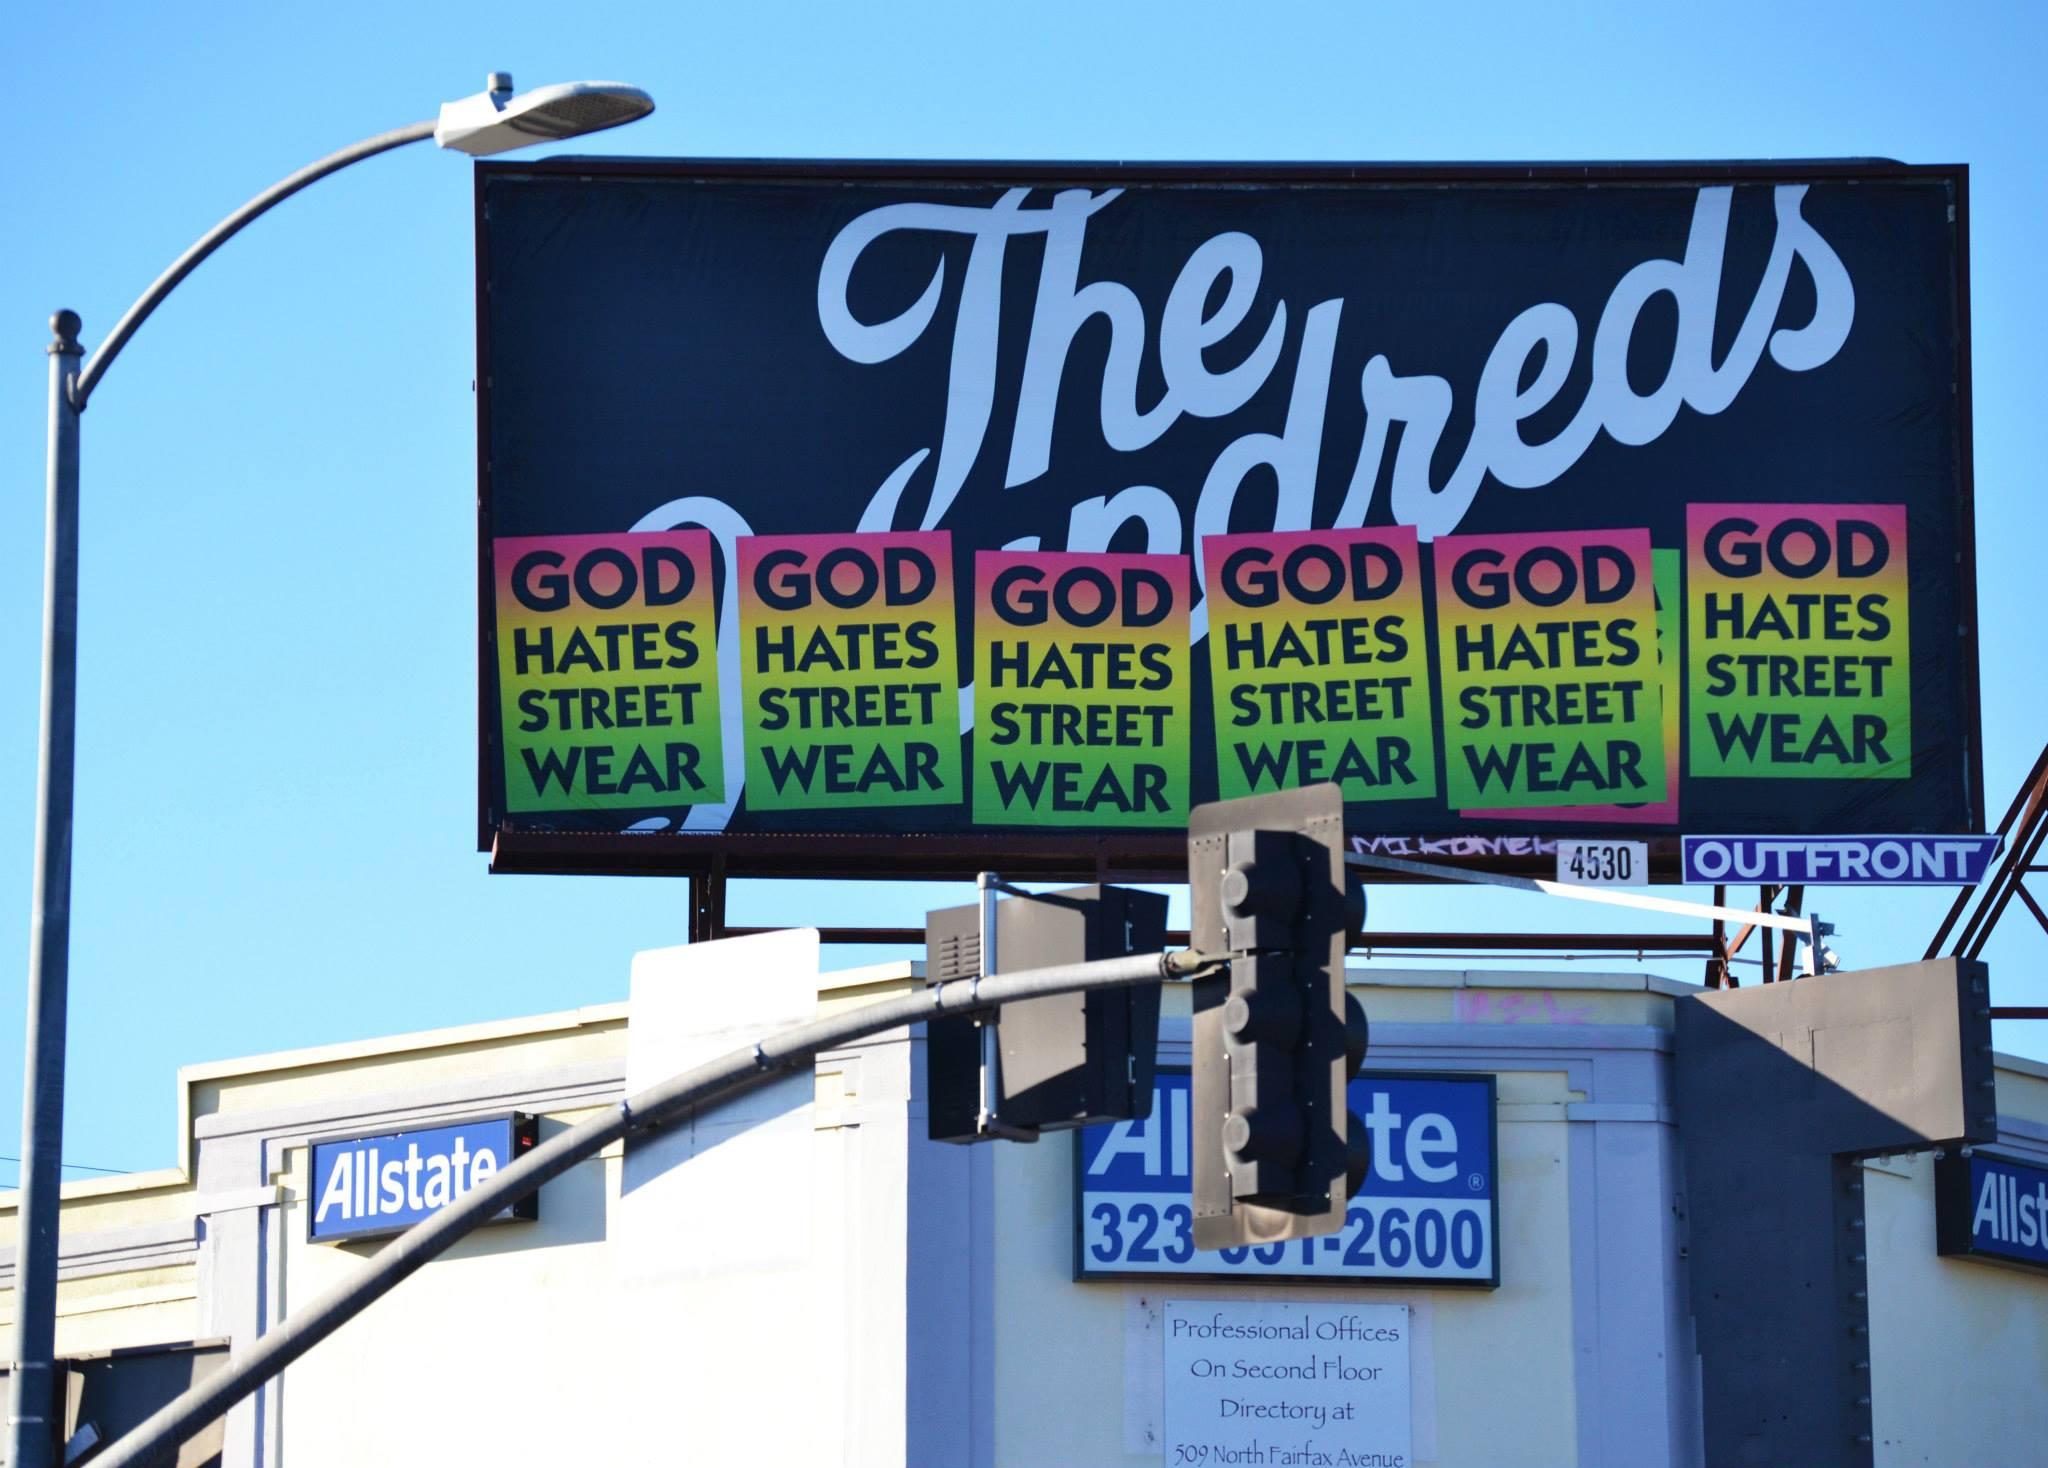 God Hates Streetwear